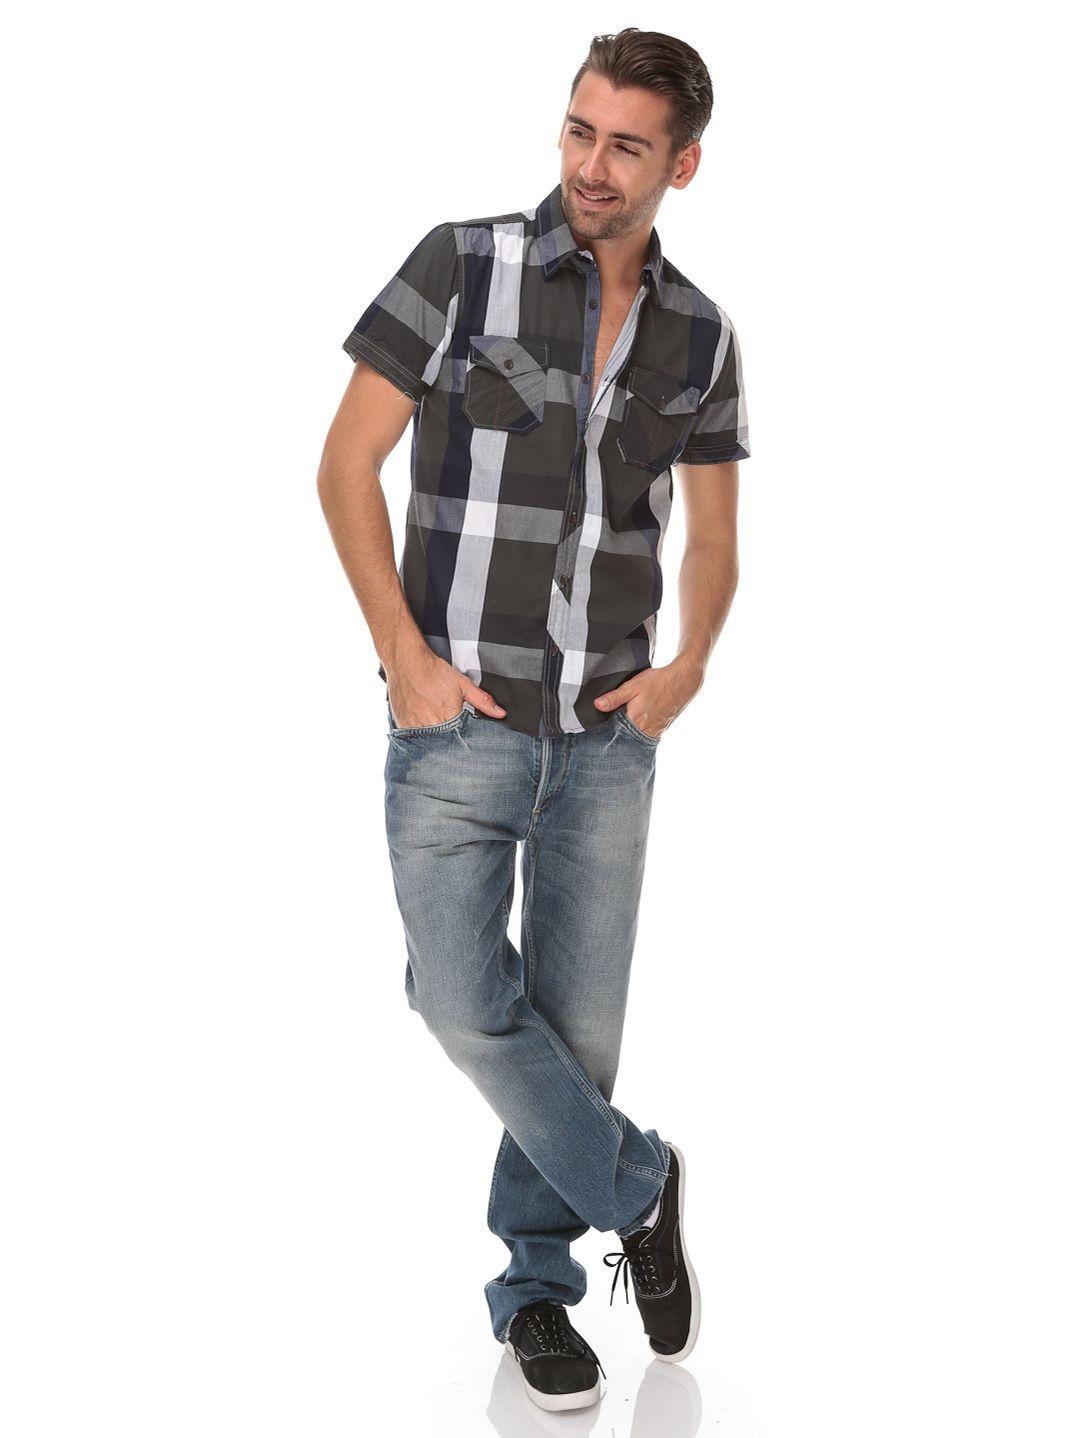 Roberts Style Slim Shirt Fashion Closet Look Men Outfit Kemeja Flanel Pria Model Slimfit Modern Dark Arthur Ideas Hombre Caballero Camisa Tienda Ropa Armario